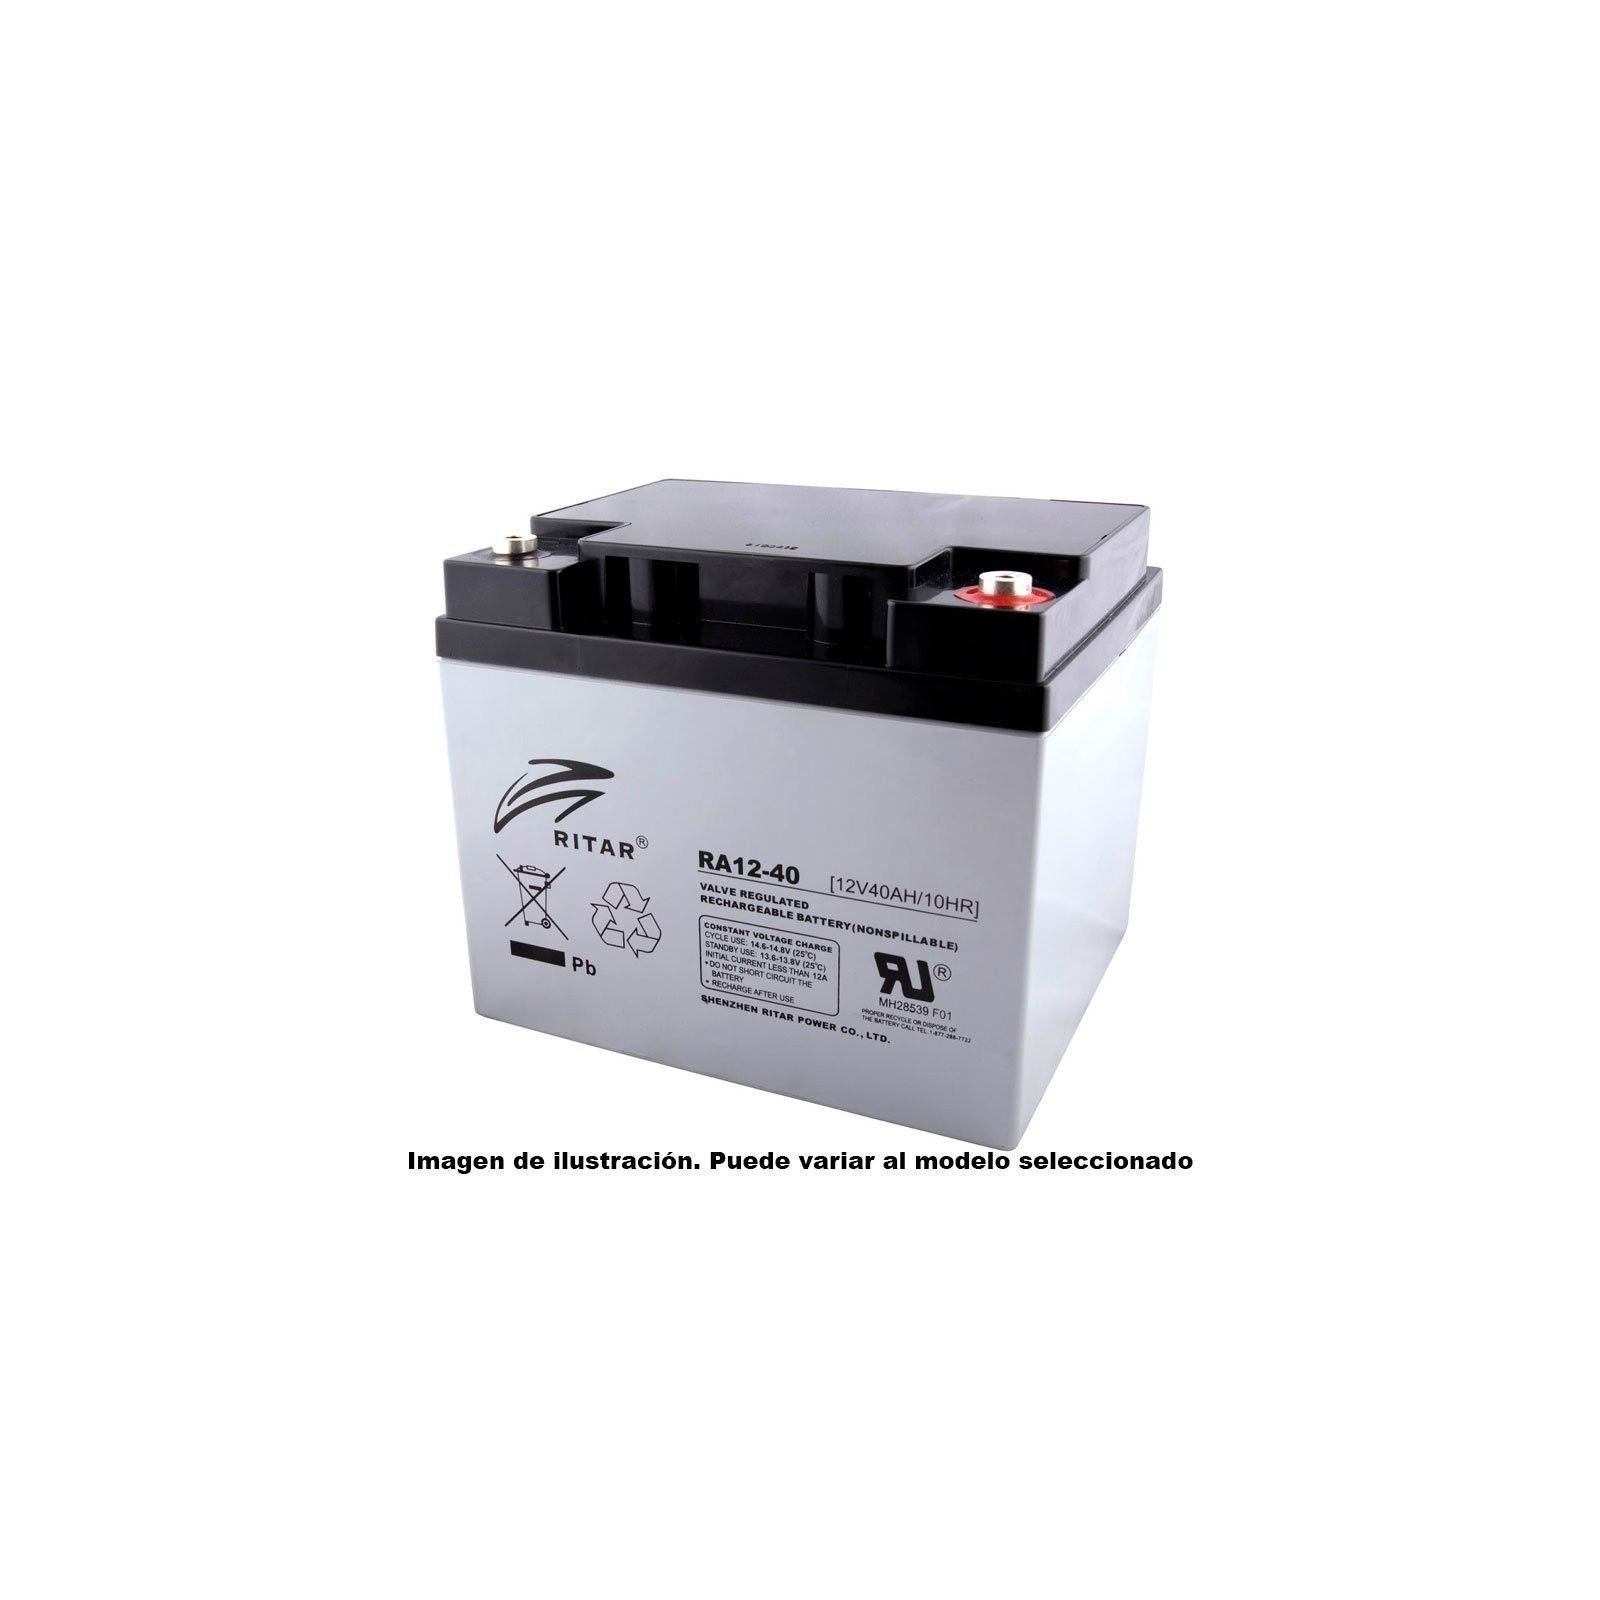 Batería Ritar RA12-40B 42Ah 12V Ra RITAR - 1